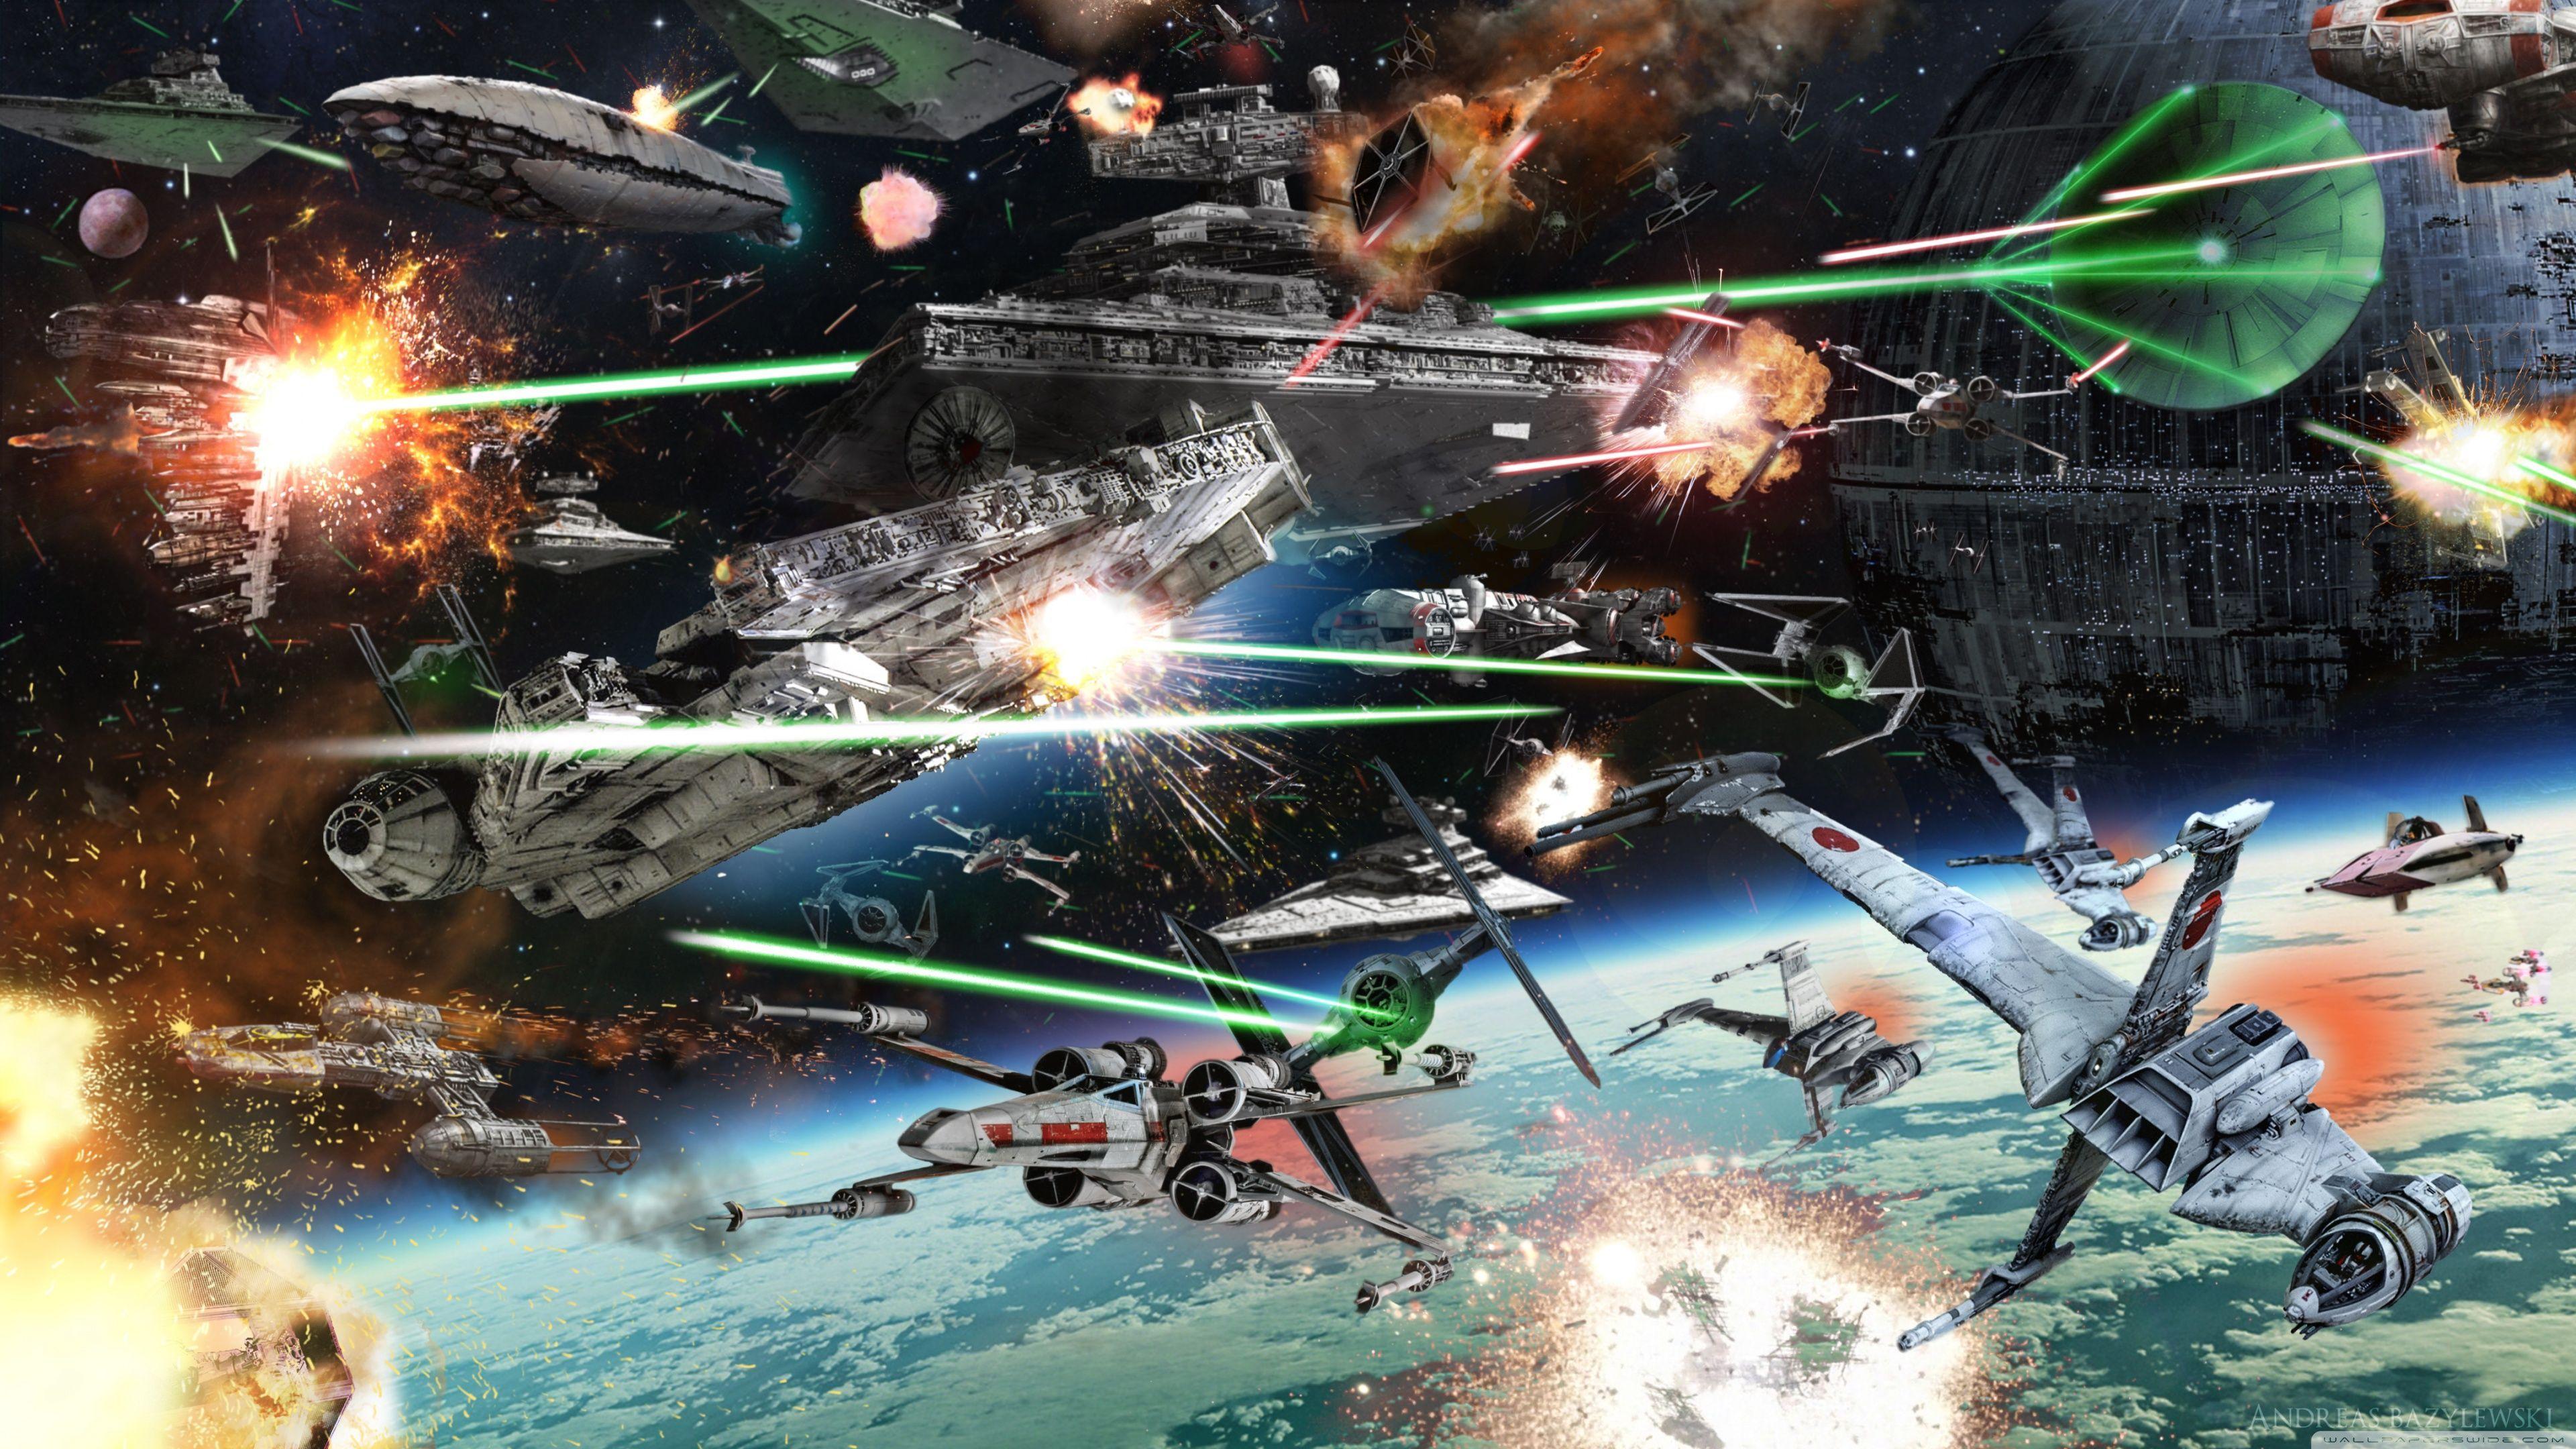 3840x2160 Star Wars Space Battle 4k Hd Desktop Wallpaper For 4k Ultra Hd Star Wars Wallpaper Star Wars Characters Star Wars Images